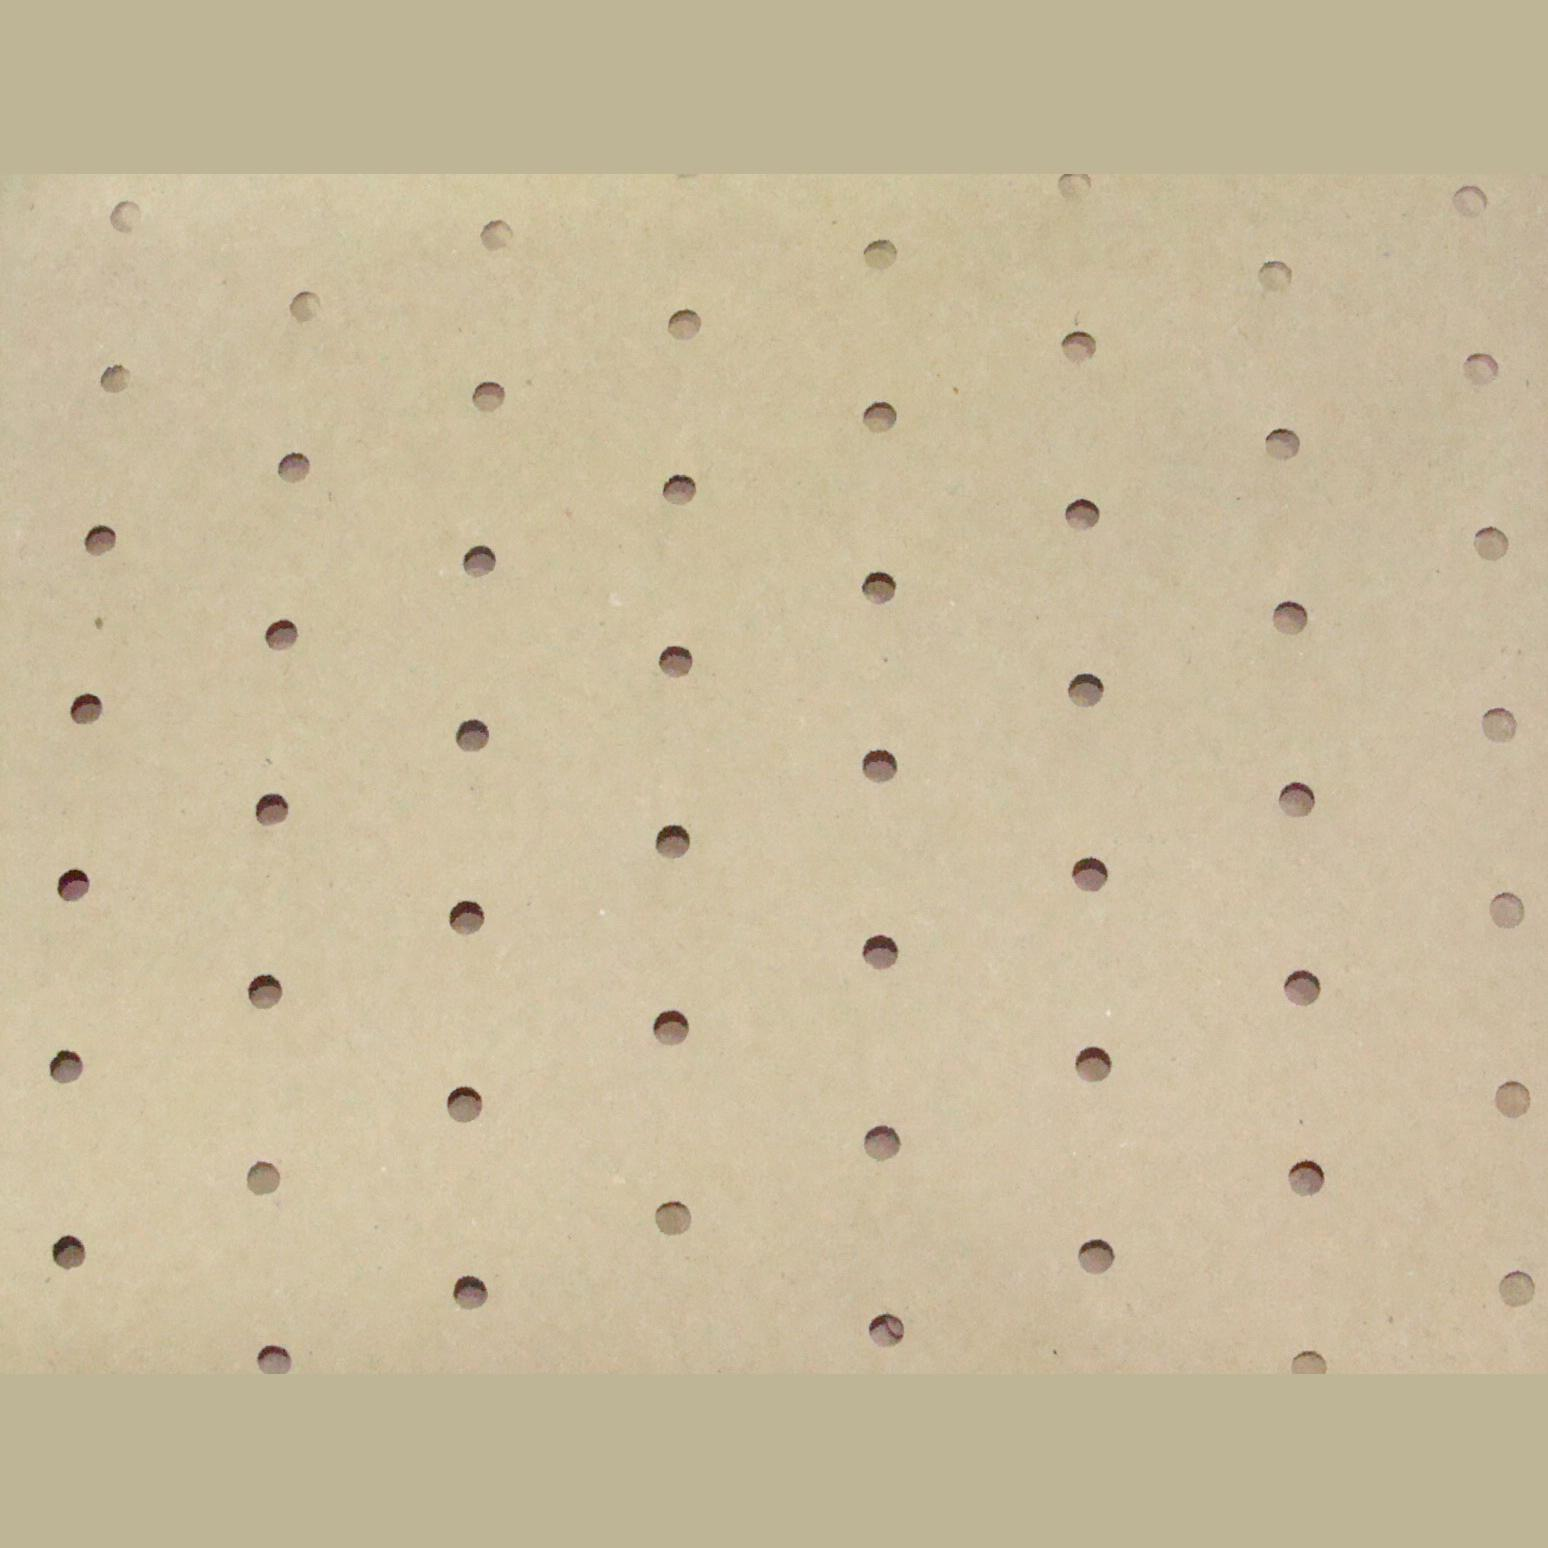 UP7536 91cm Perforated Underlay 75gsm x 200m-0